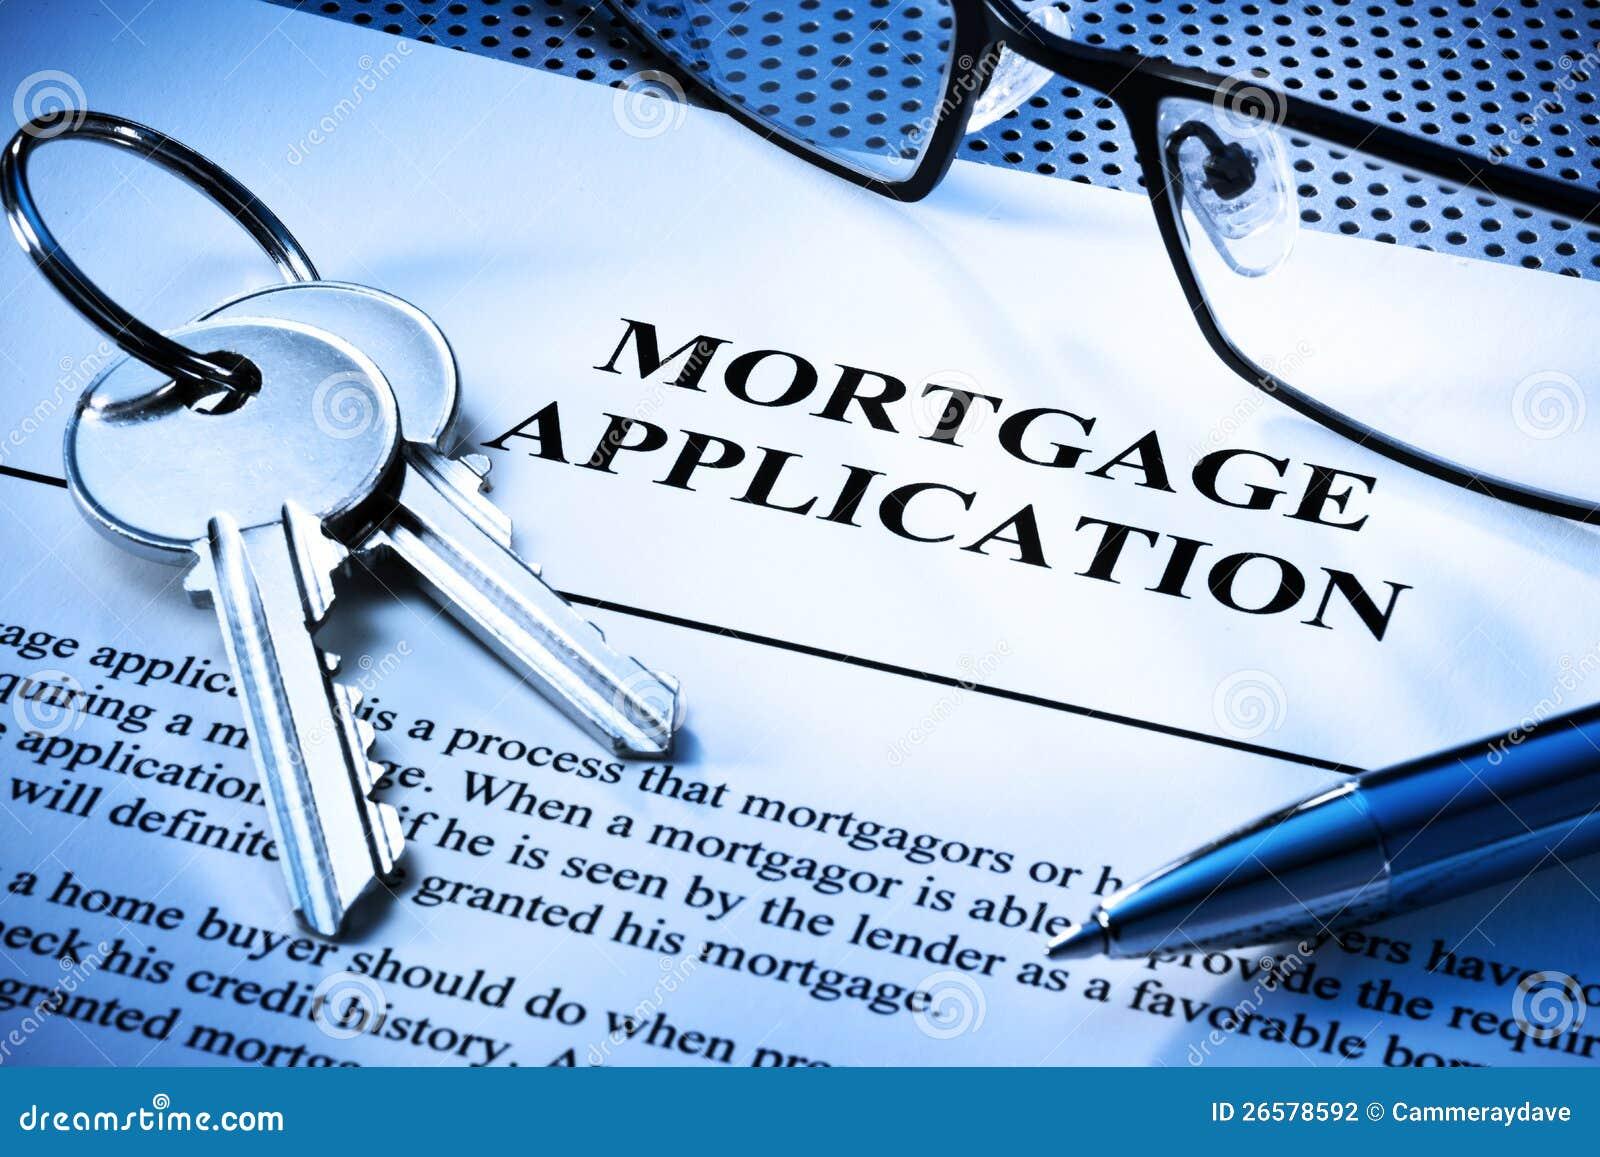 Applicazione di prestiti immobiliari di ipoteca